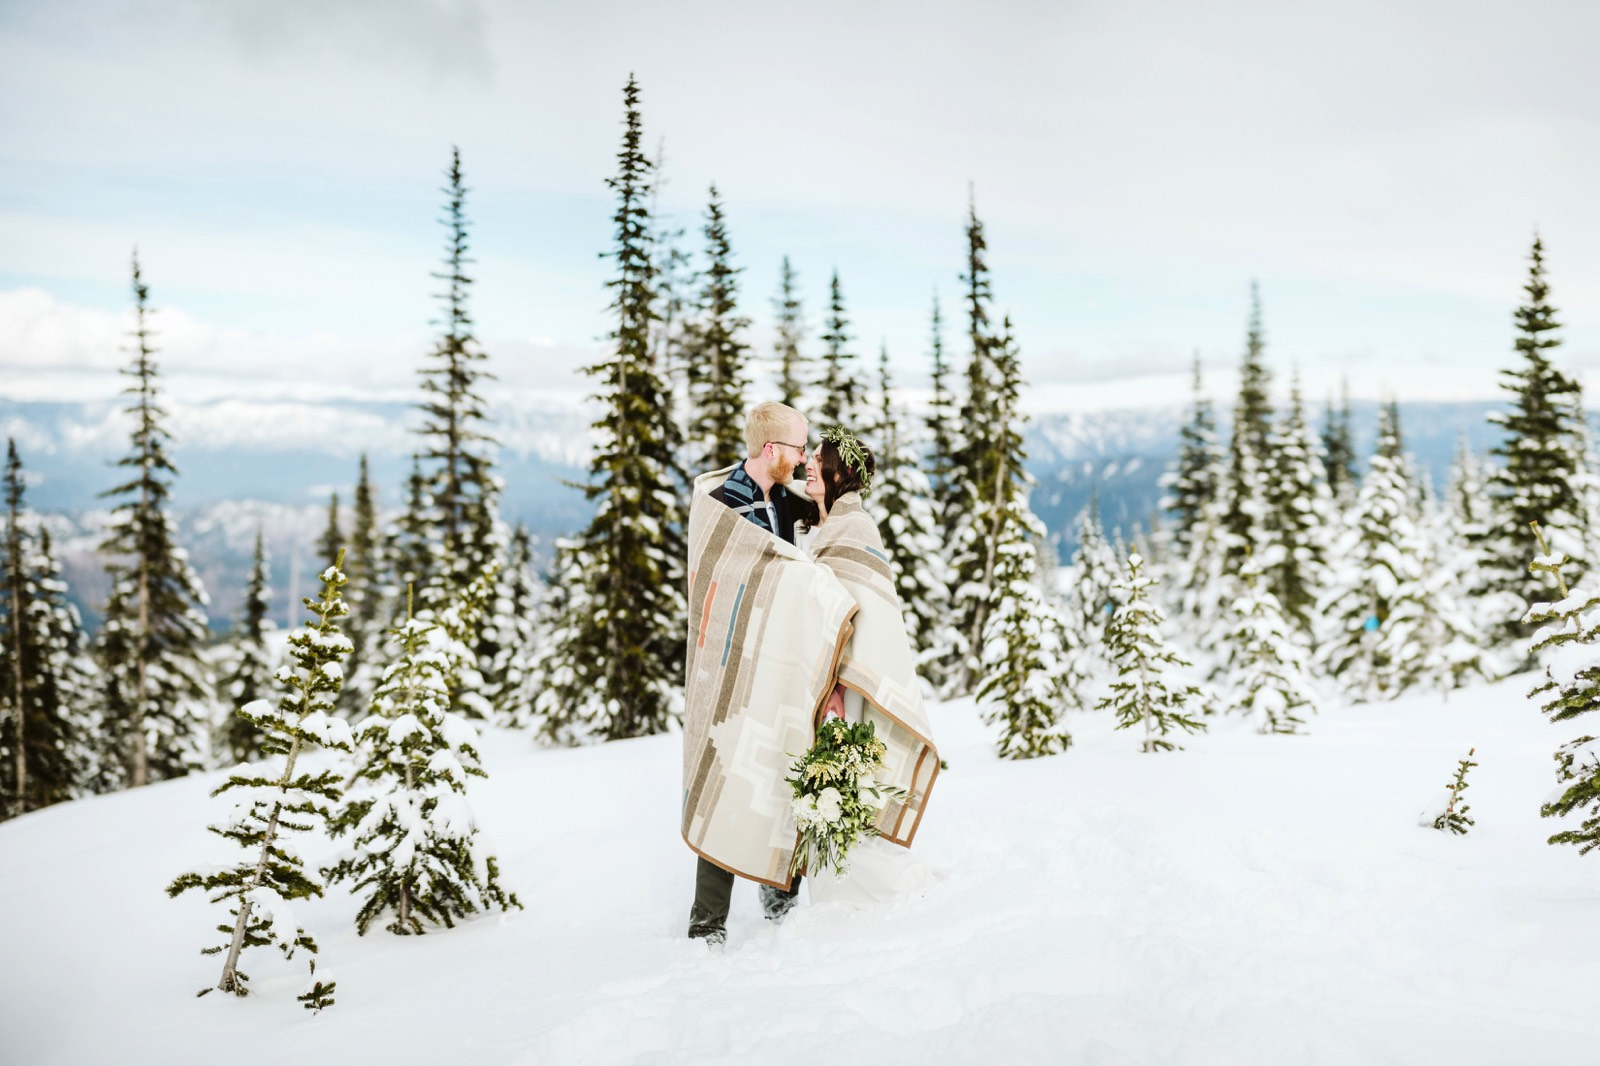 alpine-lakes-high-camp-winter-wedding-62 ALPINE LAKES HIGH CAMP WEDDING